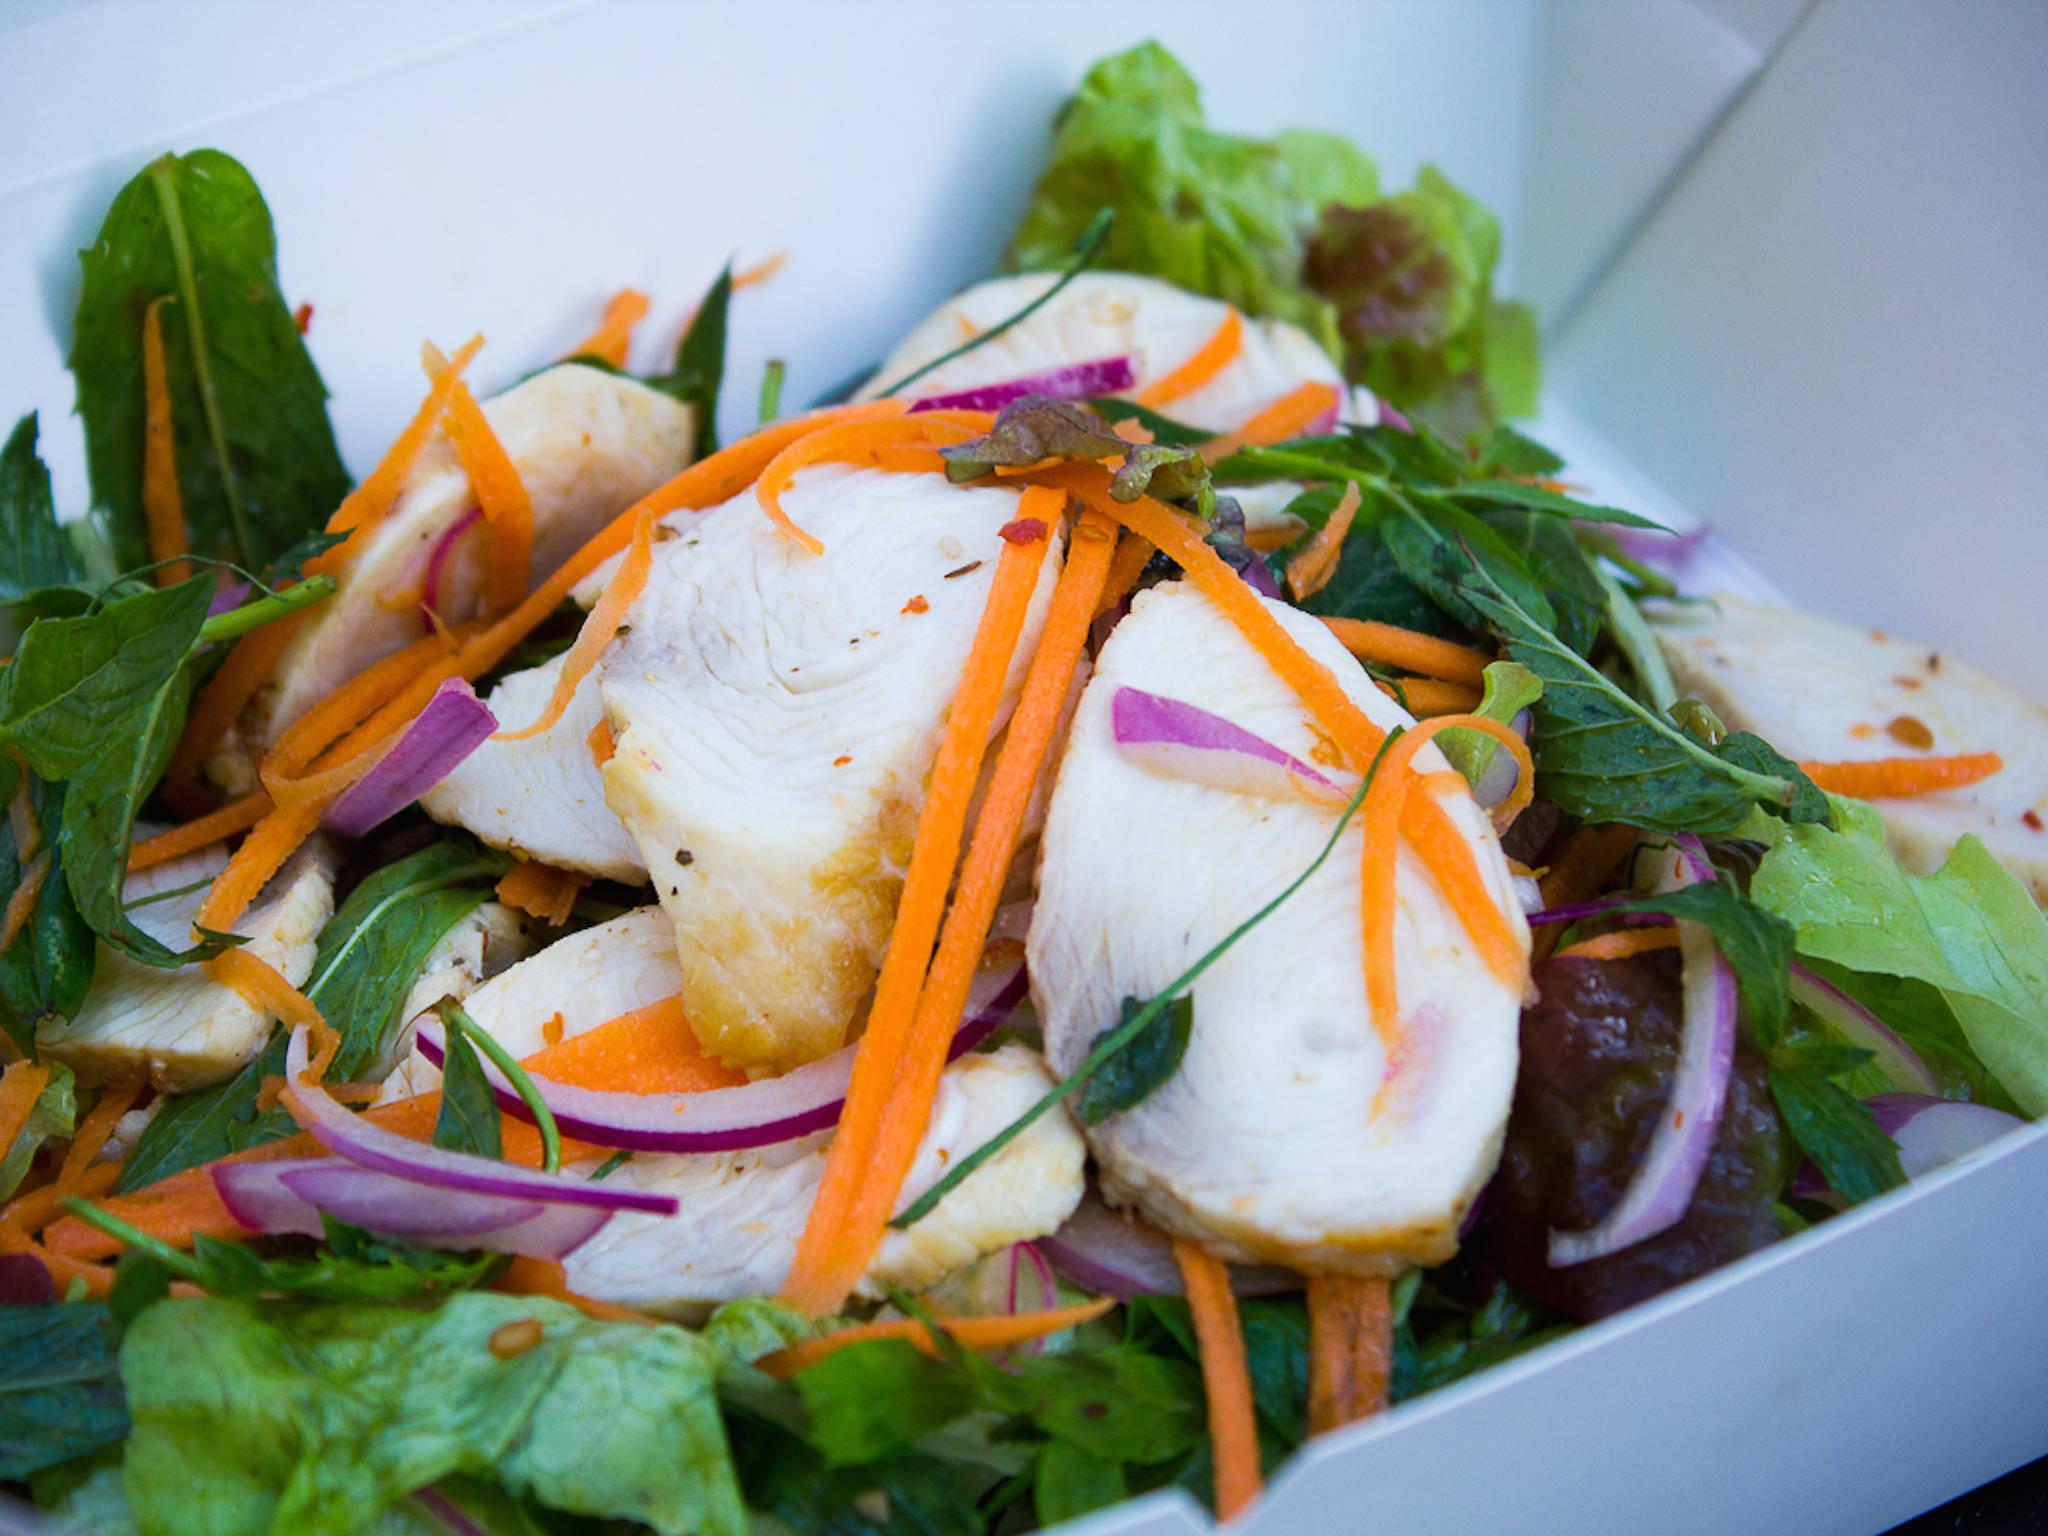 Northern Territory cuisine